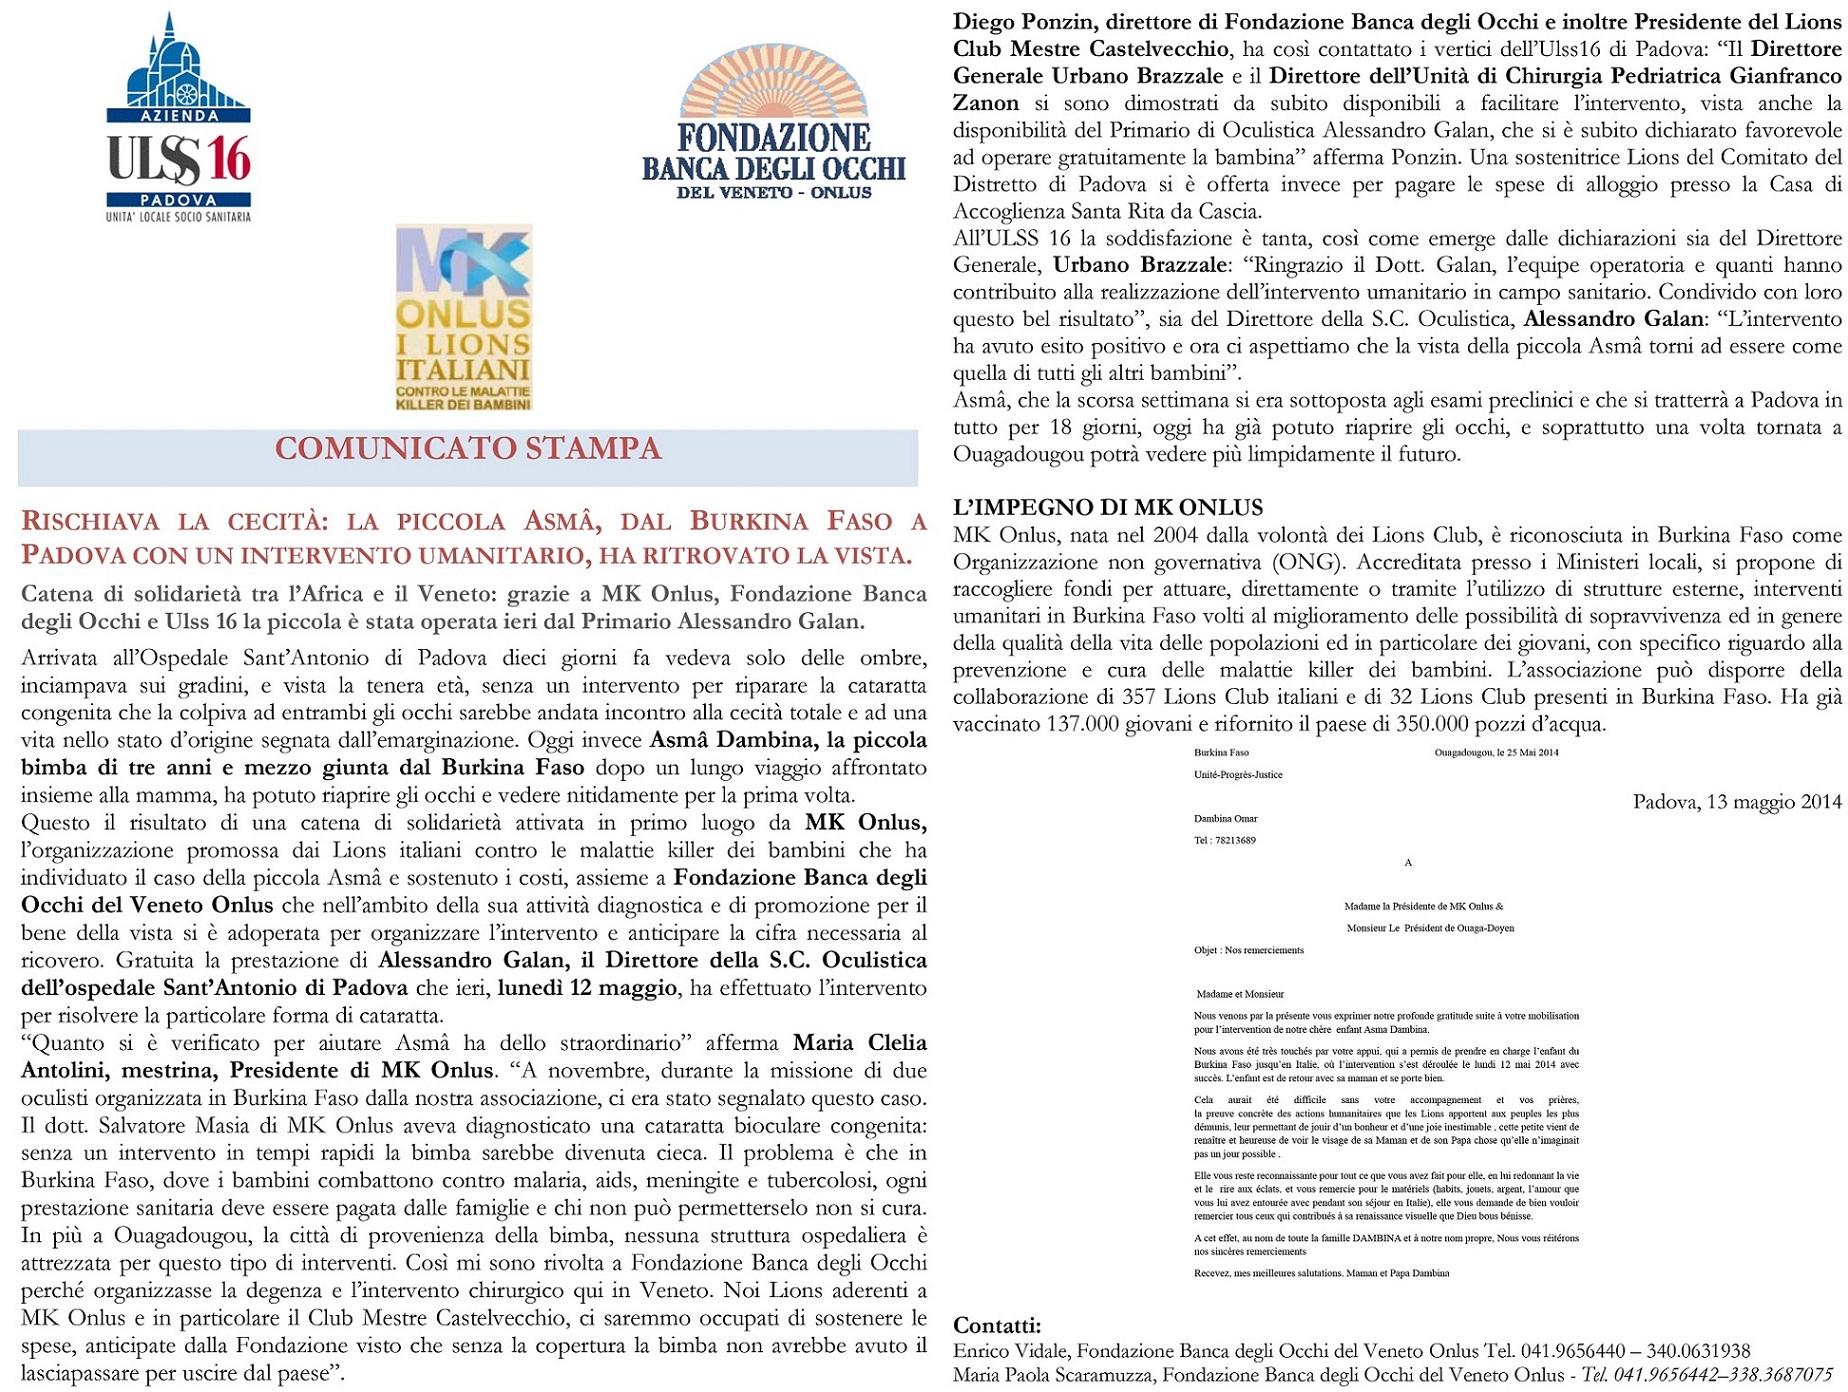 ASMA CS Lions- Intervento umanitario bimba Burkina Faso-1 - Copia